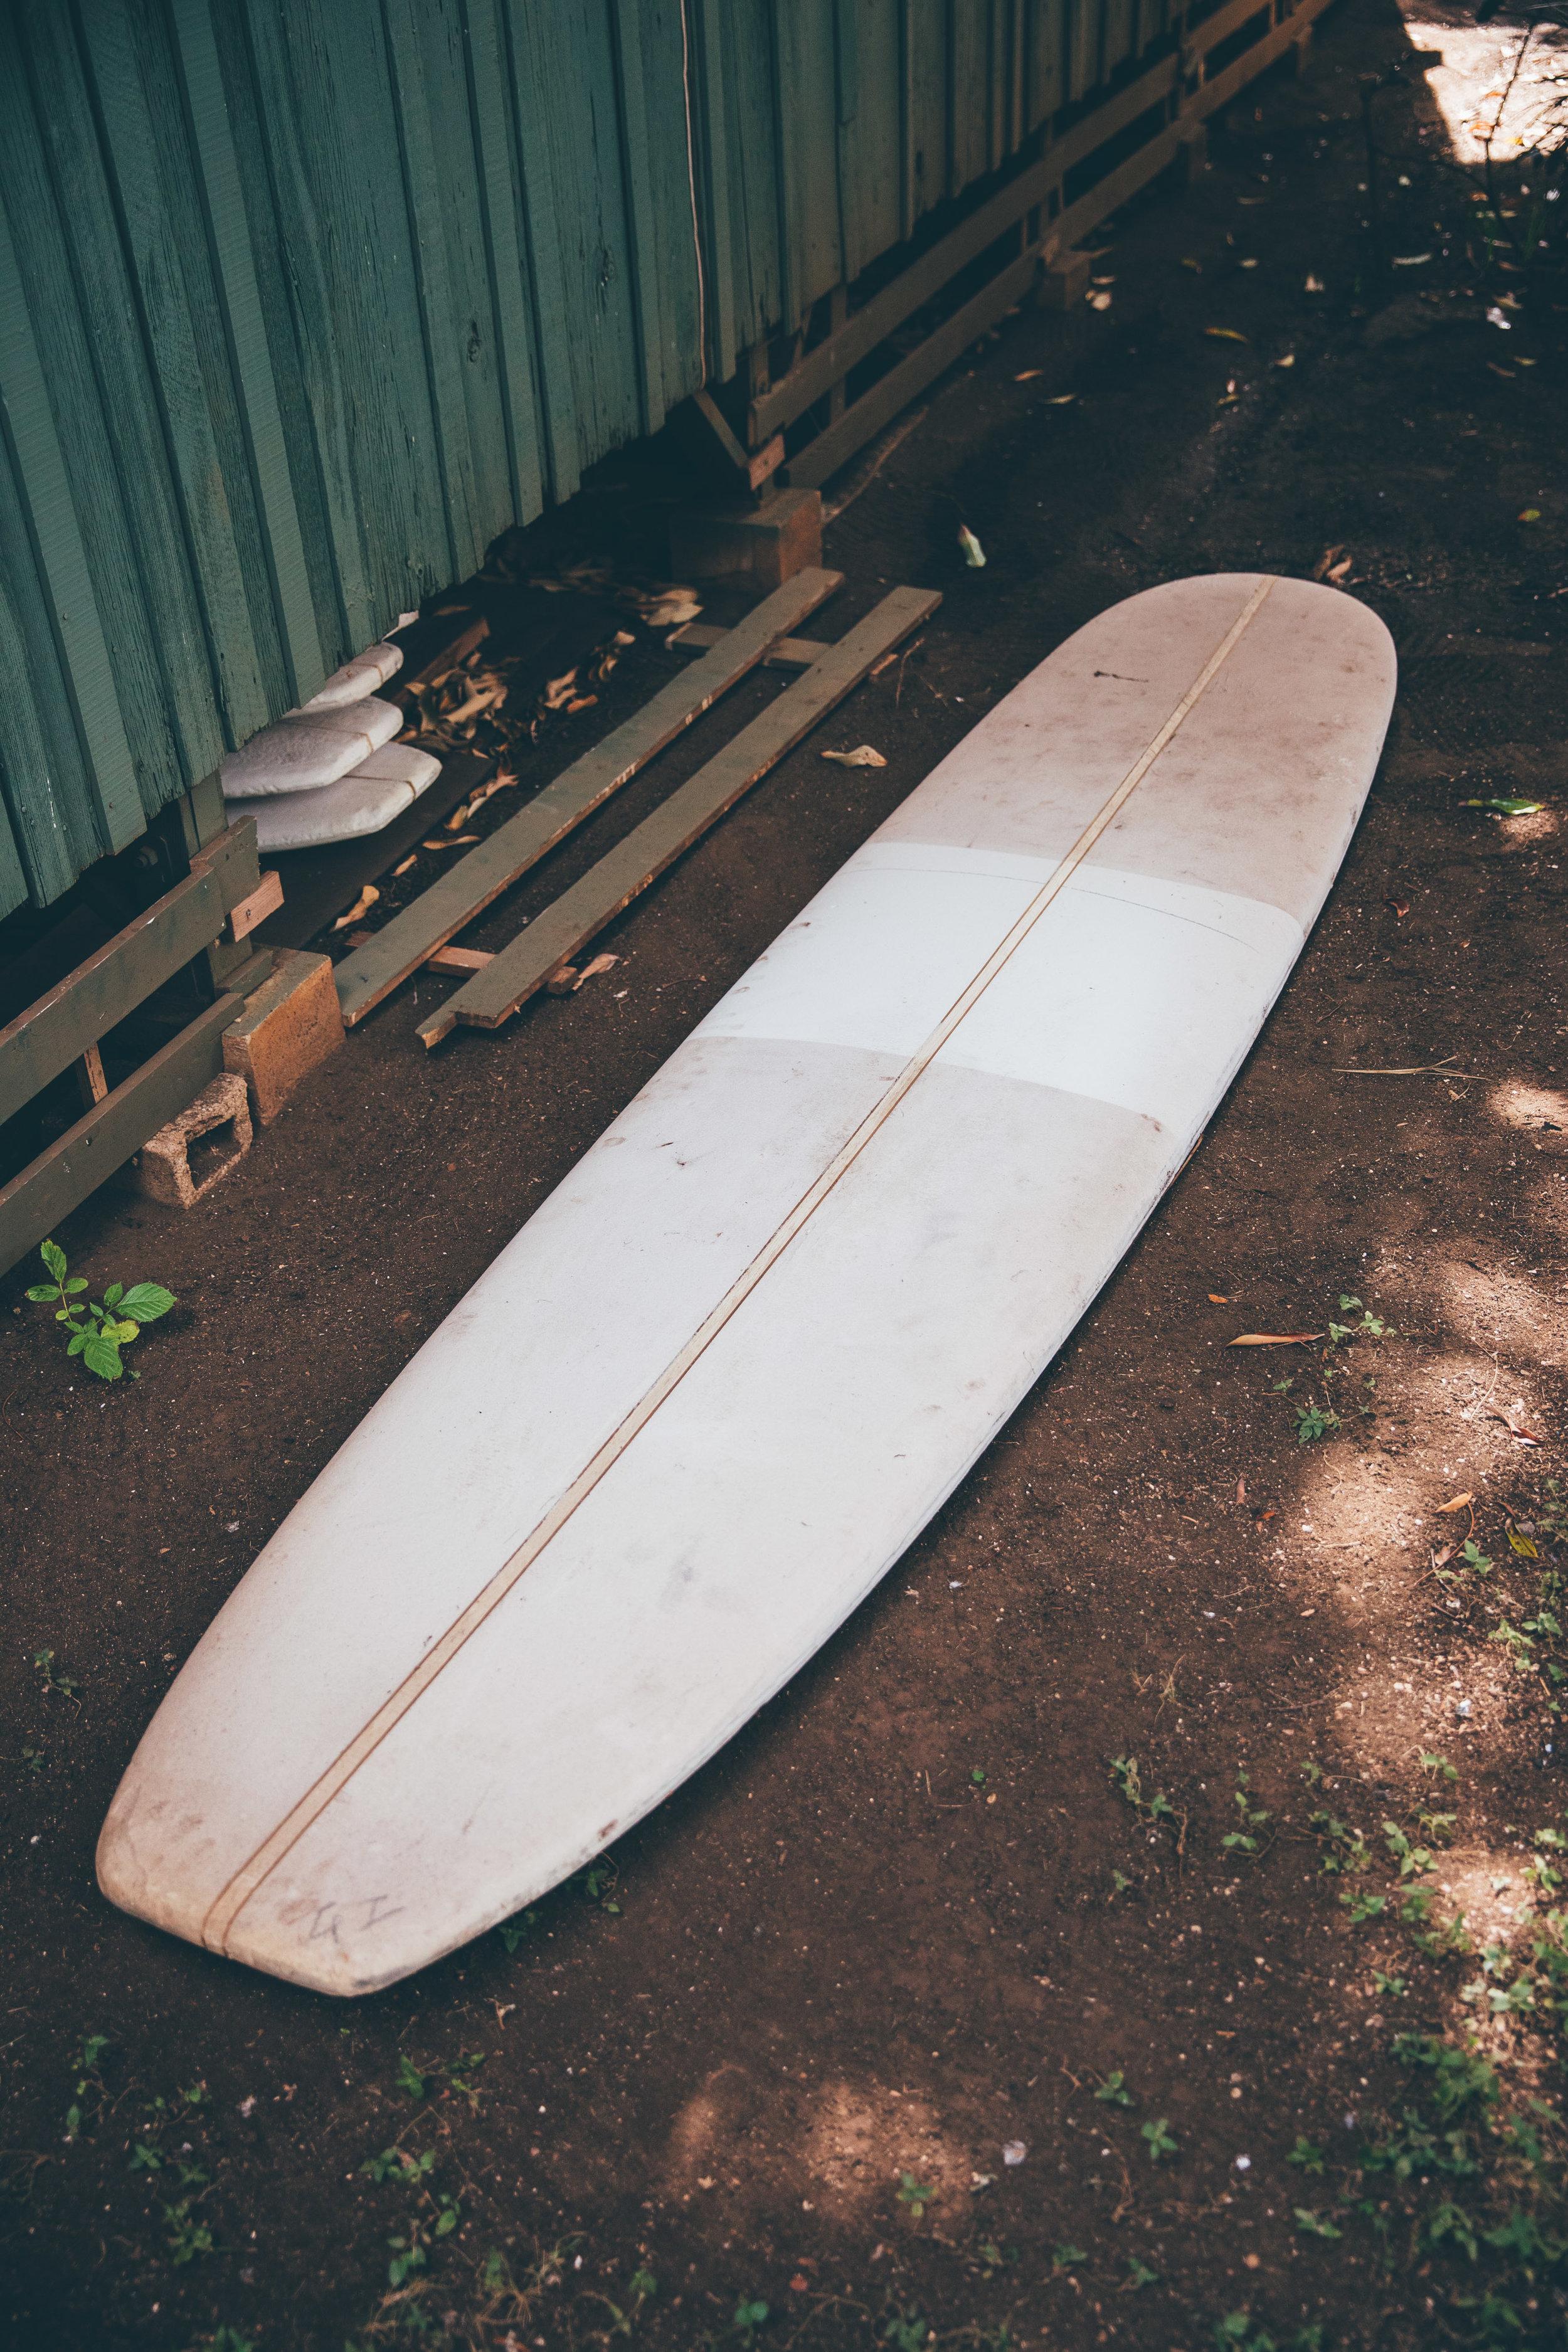 bryce johnson-photography-ebert surfboards-kauai-6.jpg